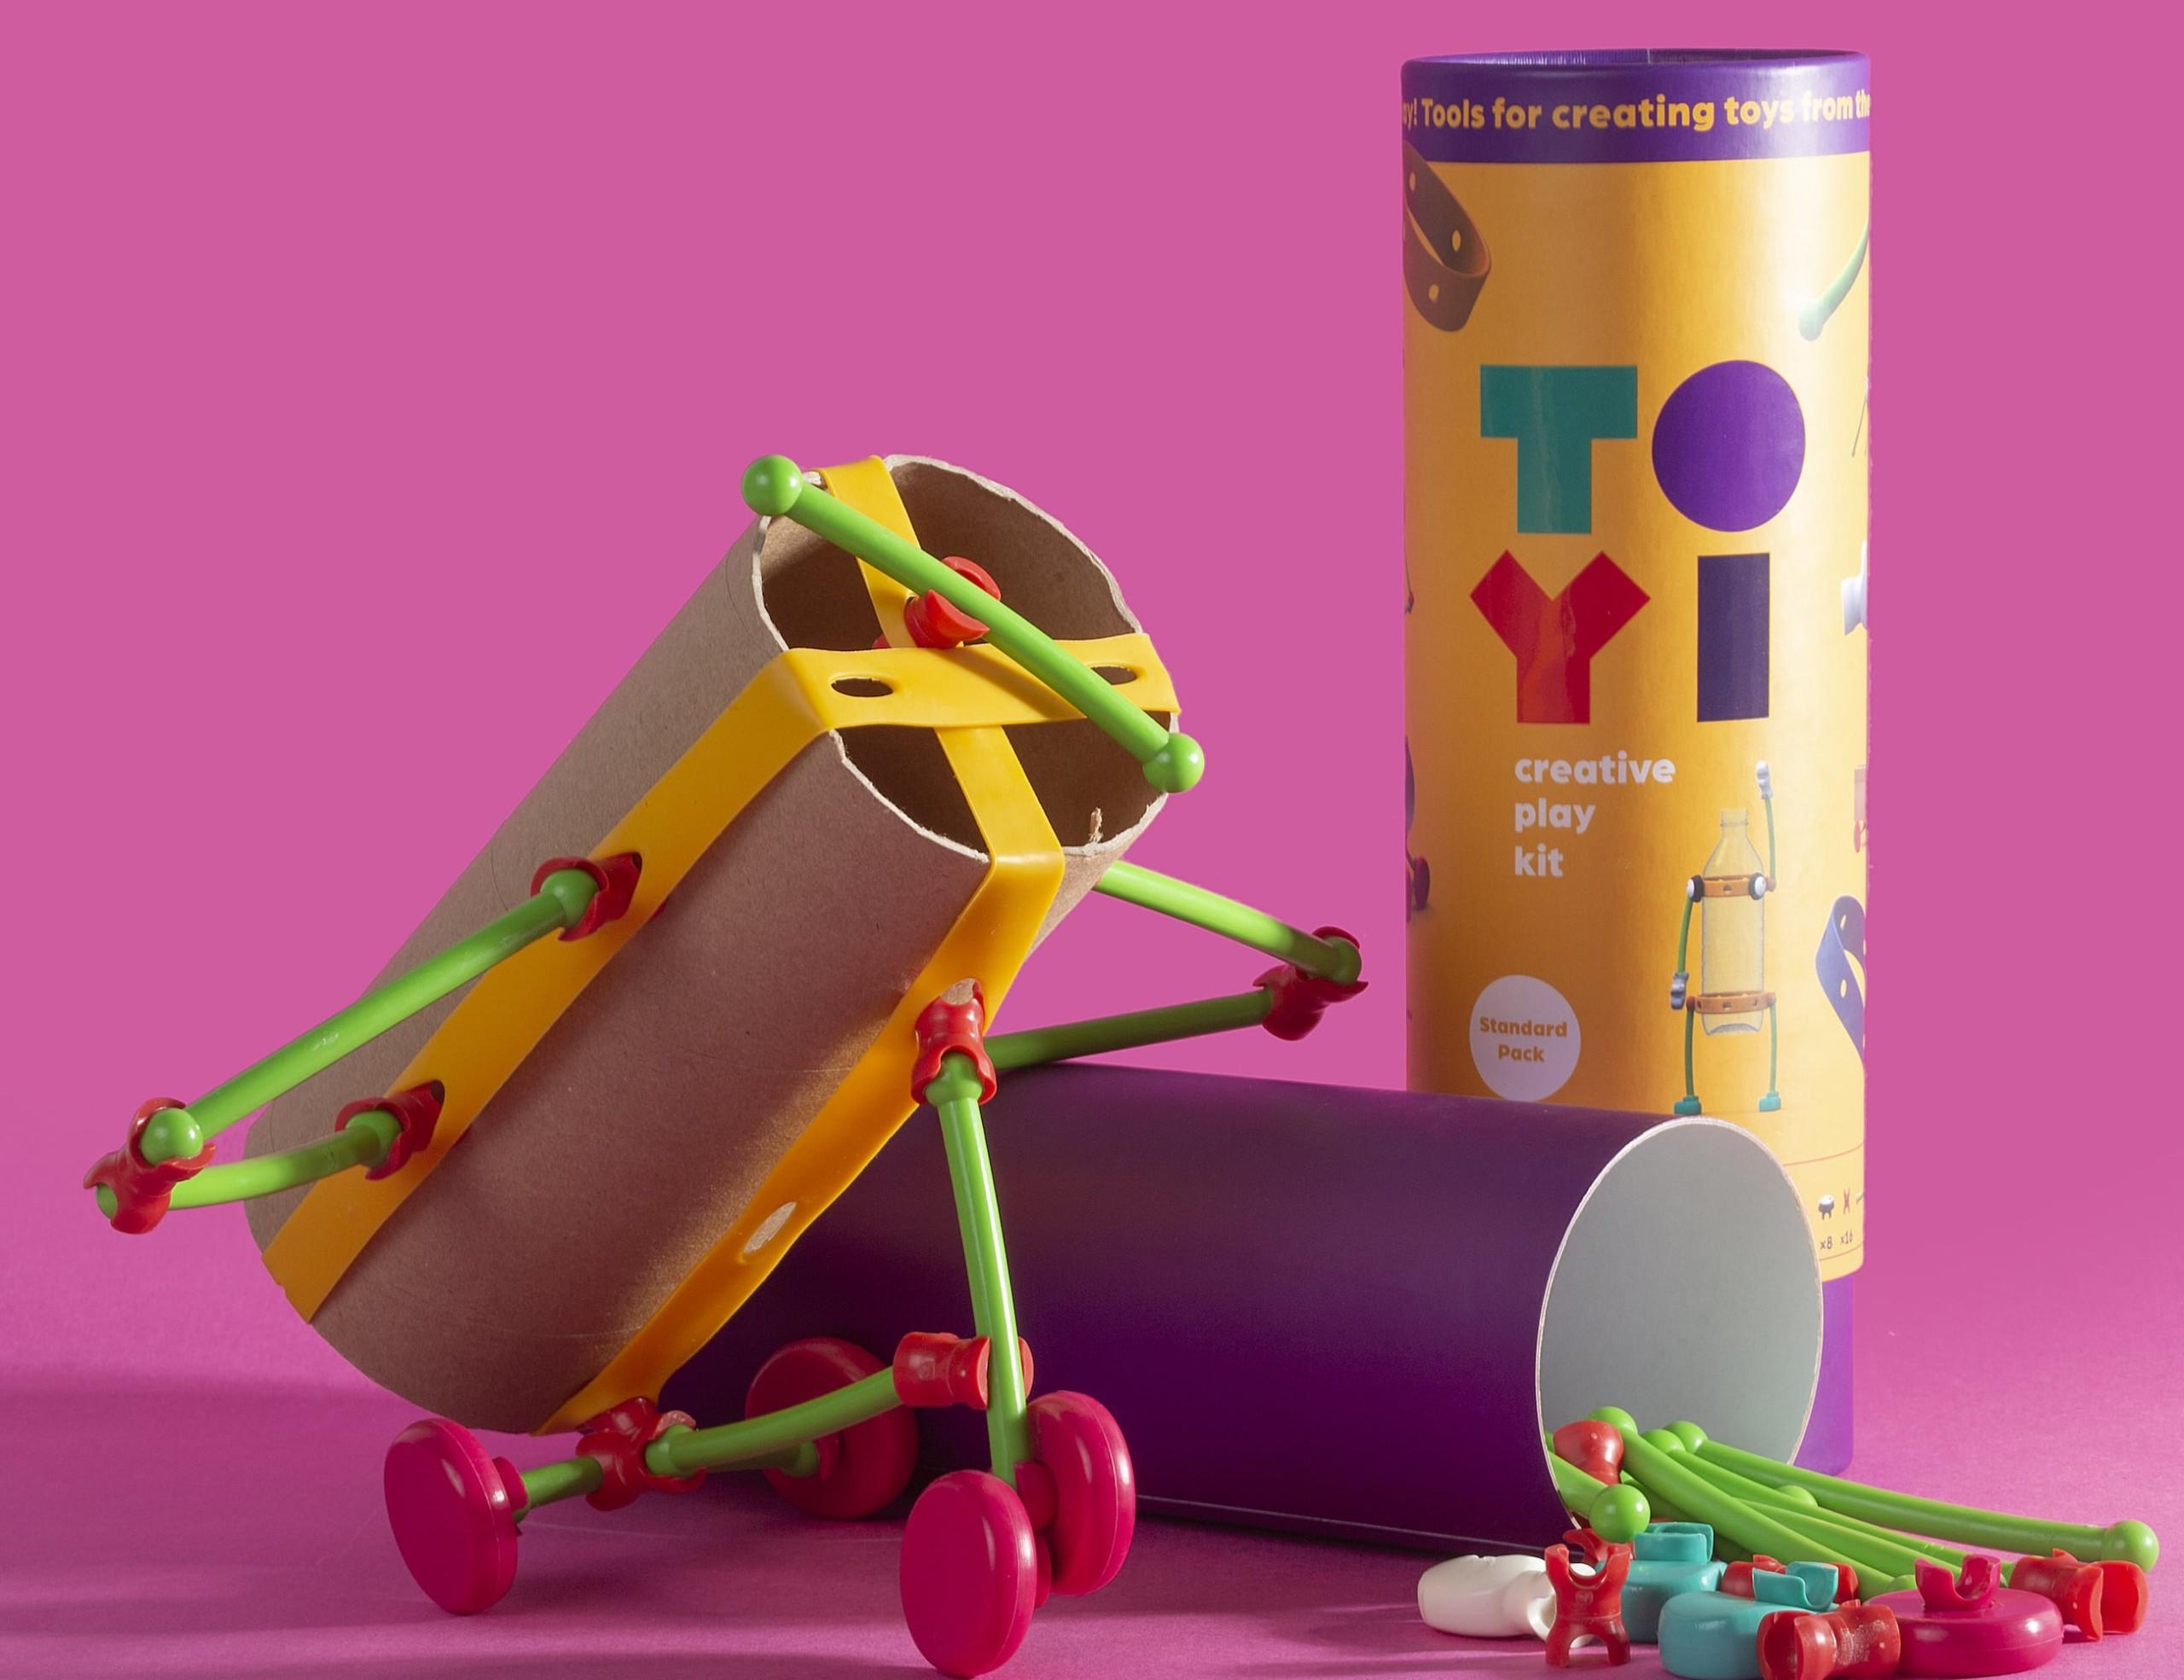 Toyi Limitless Creative Play Kit